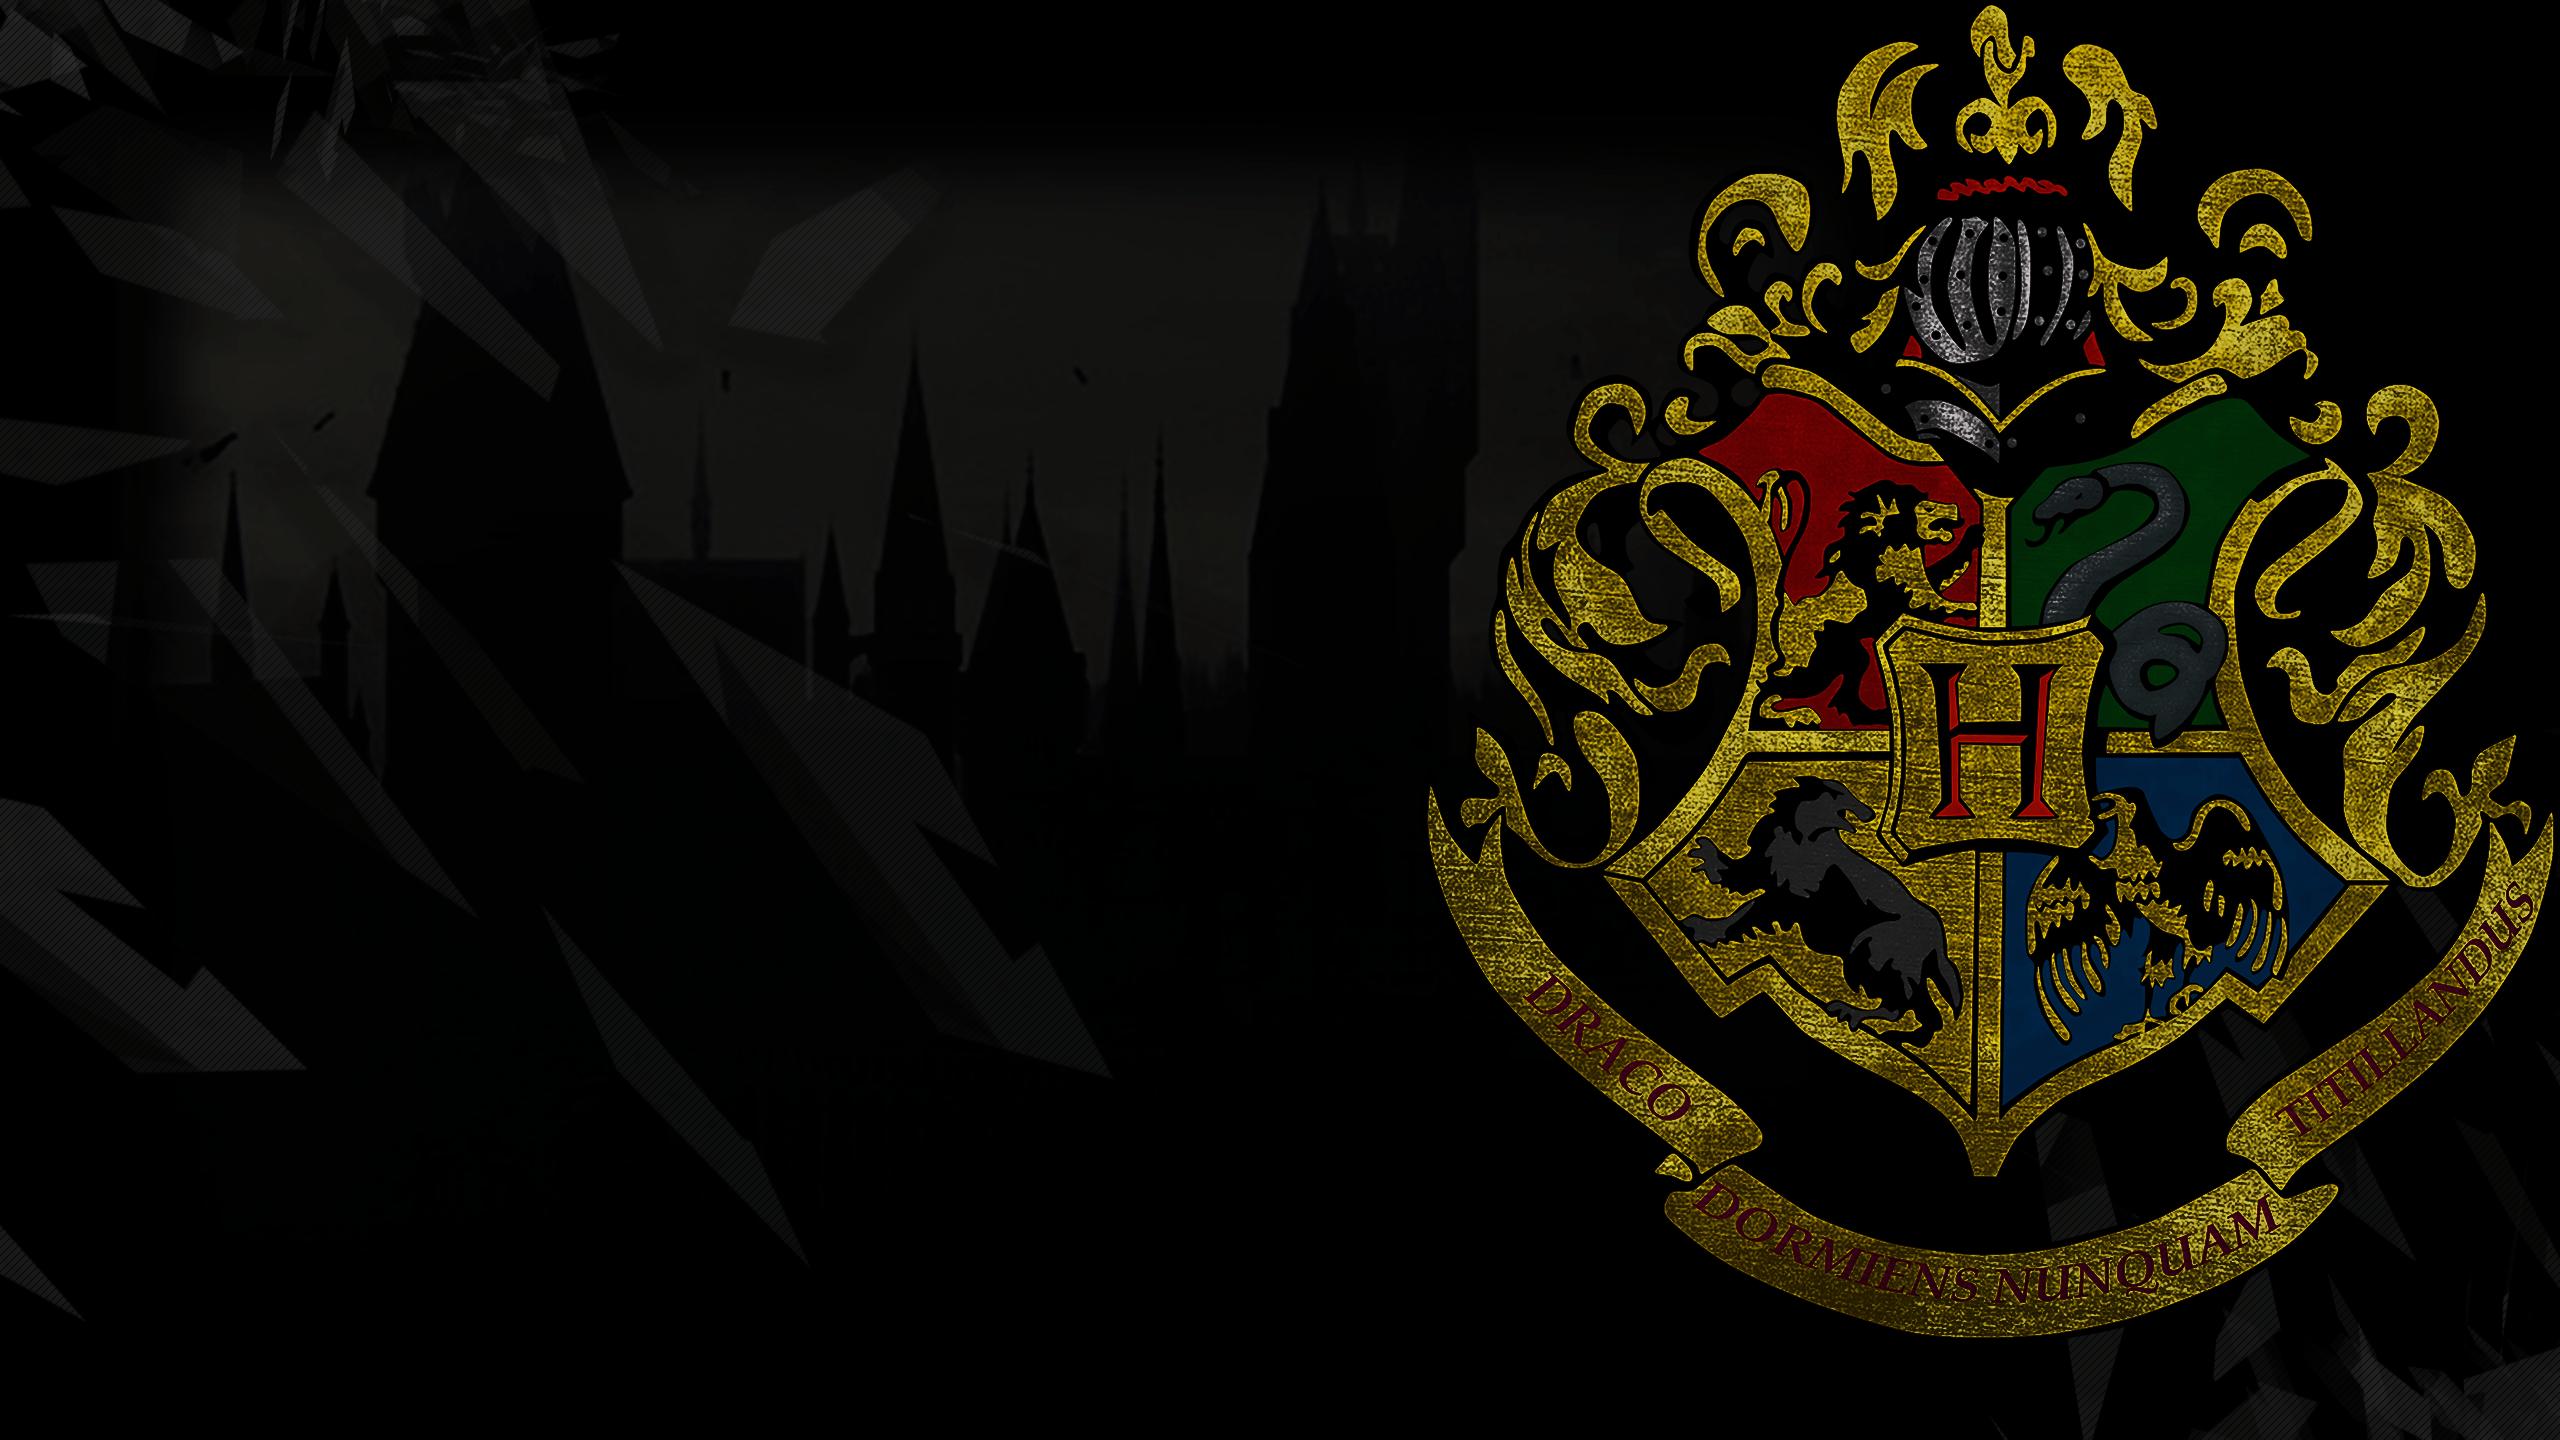 Harry Potter Gryffindor Desktop Wallpapers Top Free Harry Potter